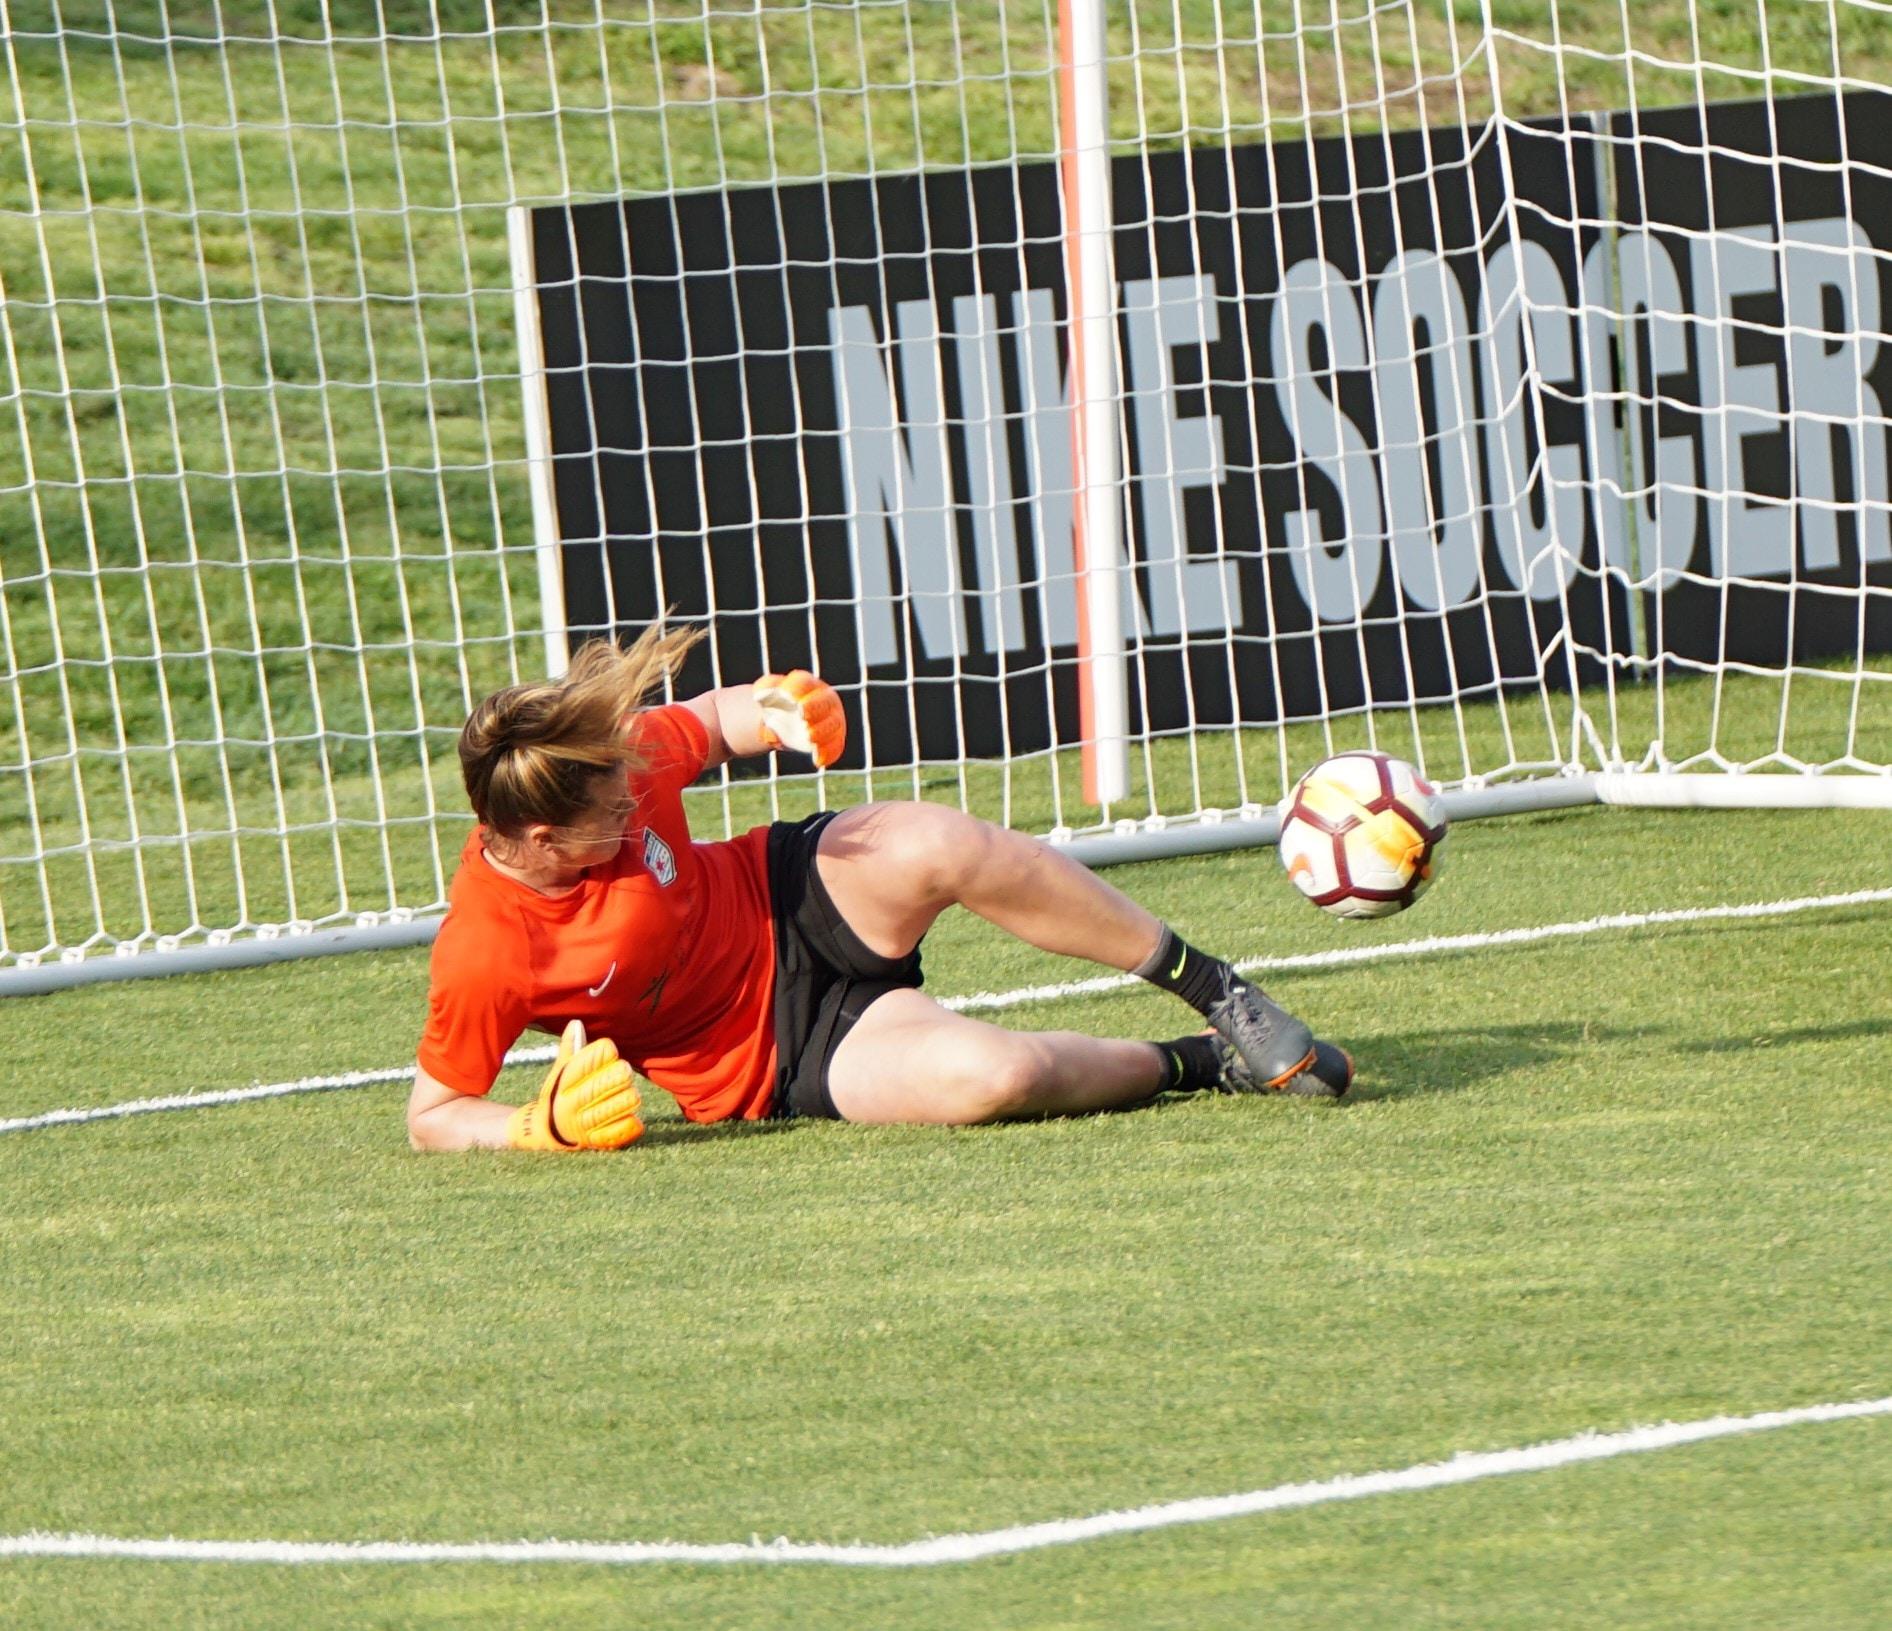 goal keeper lying on grass